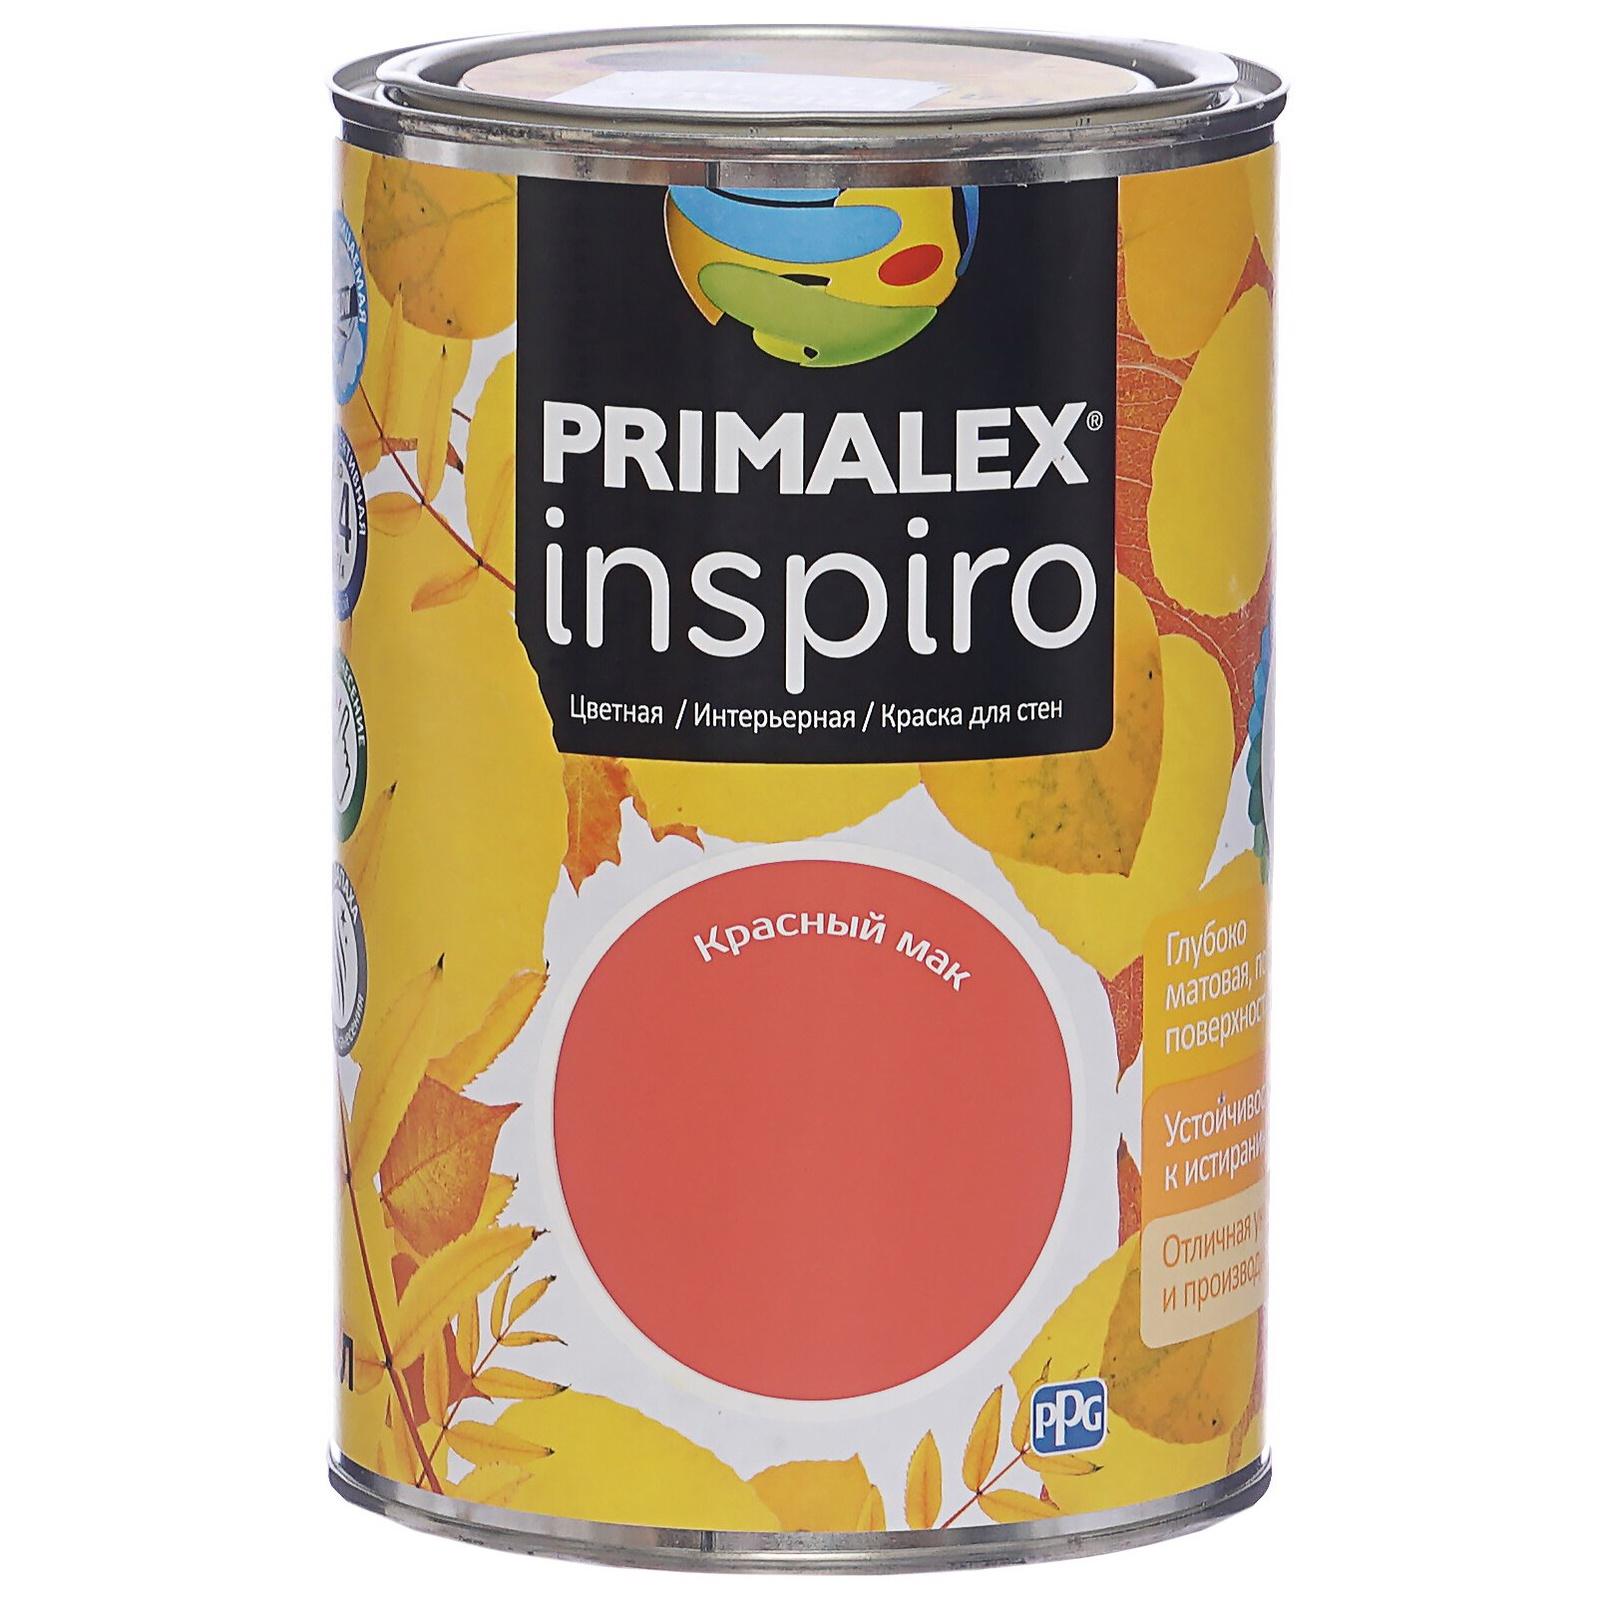 Краска PPG Primalex Inspiro Красный Мак 1л, 420194 краска ppg primalex inspiro красный мак 40мл pmx i47